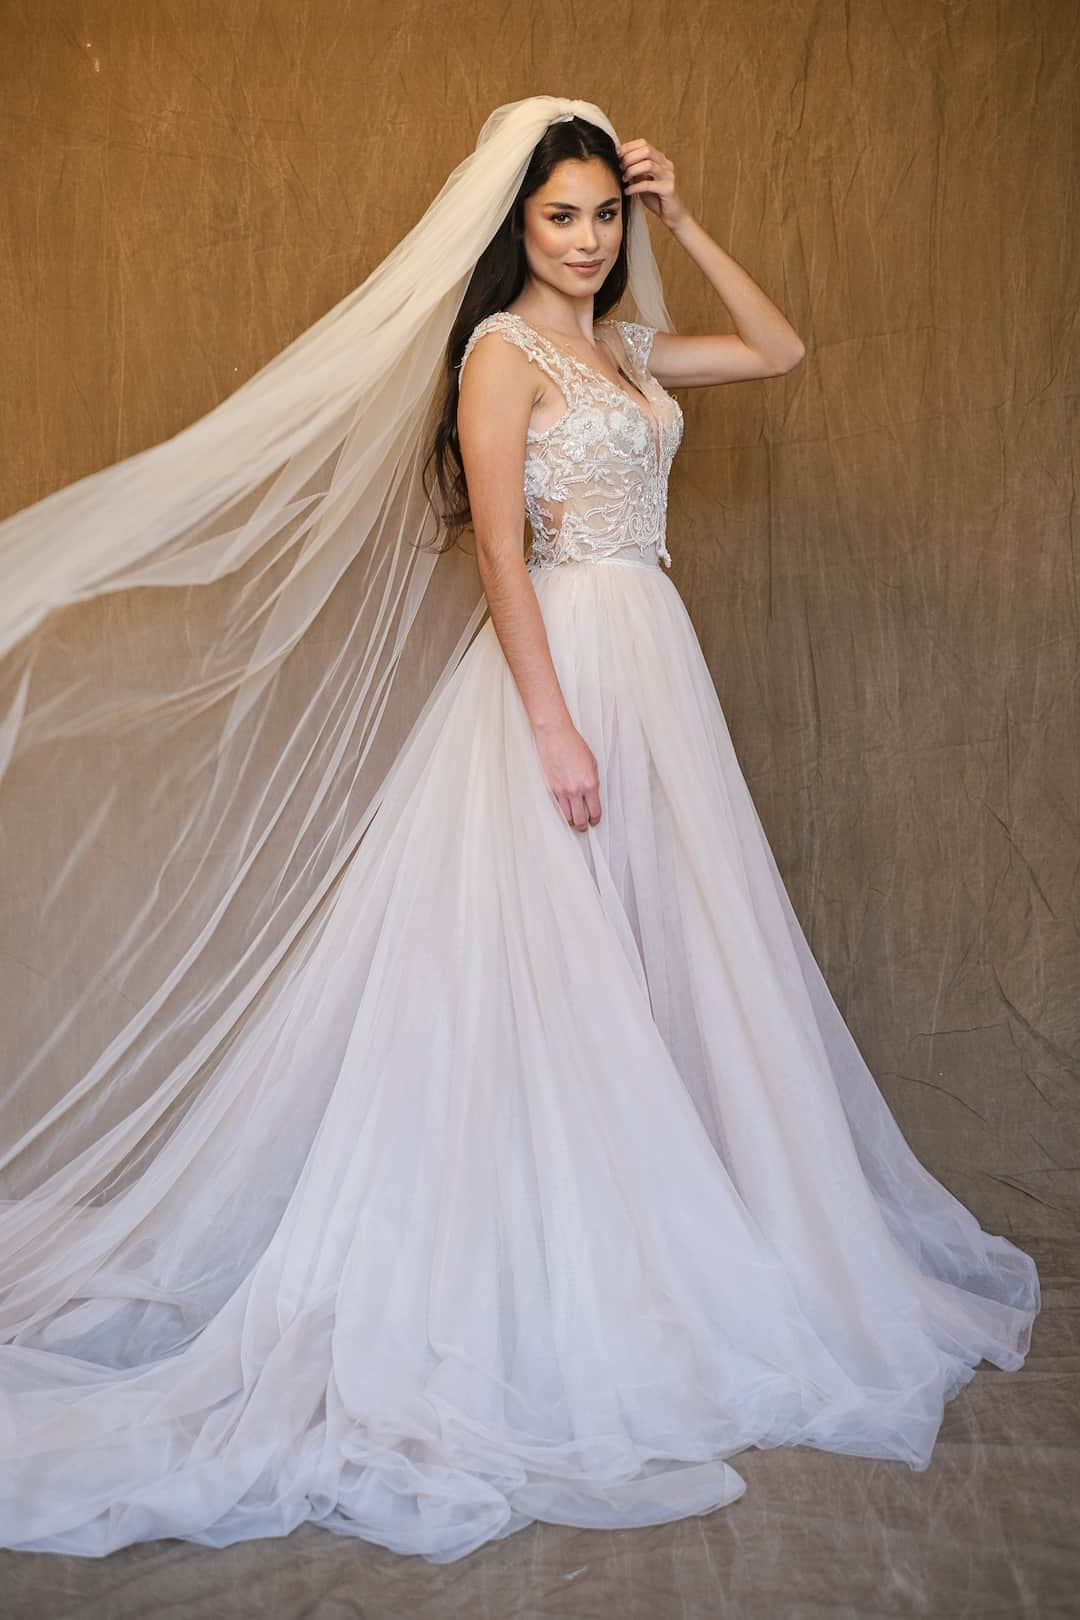 Haute couture svadobné šaty - Galia Lahav - Gala 607 - front